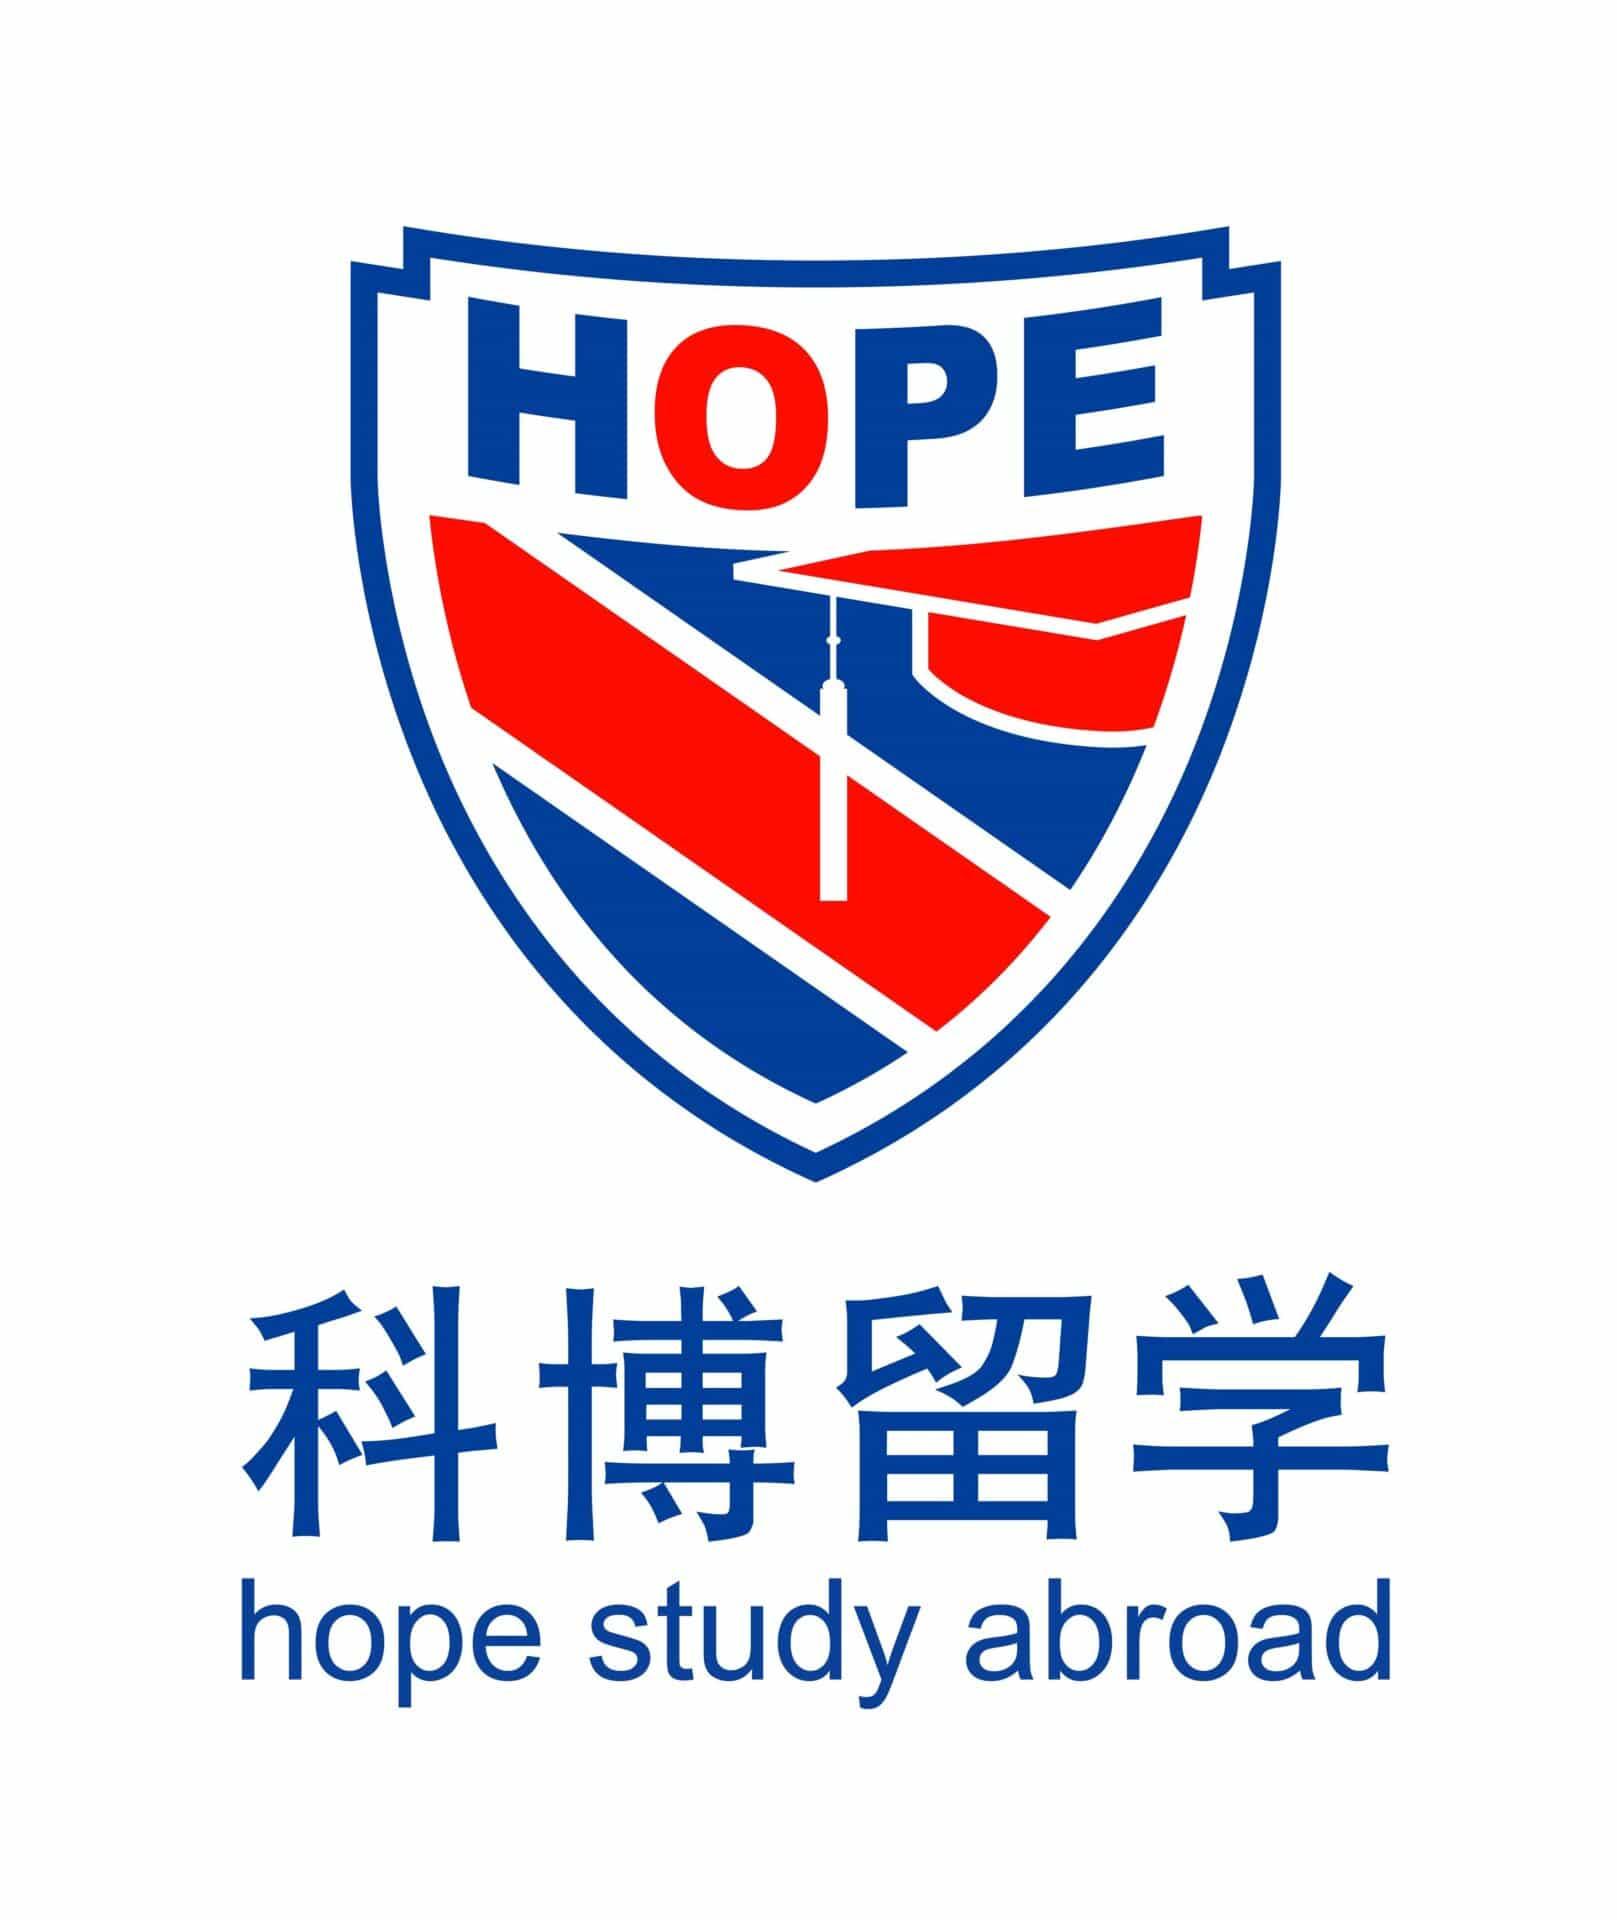 Hope-1-448x249-c-default.jpg